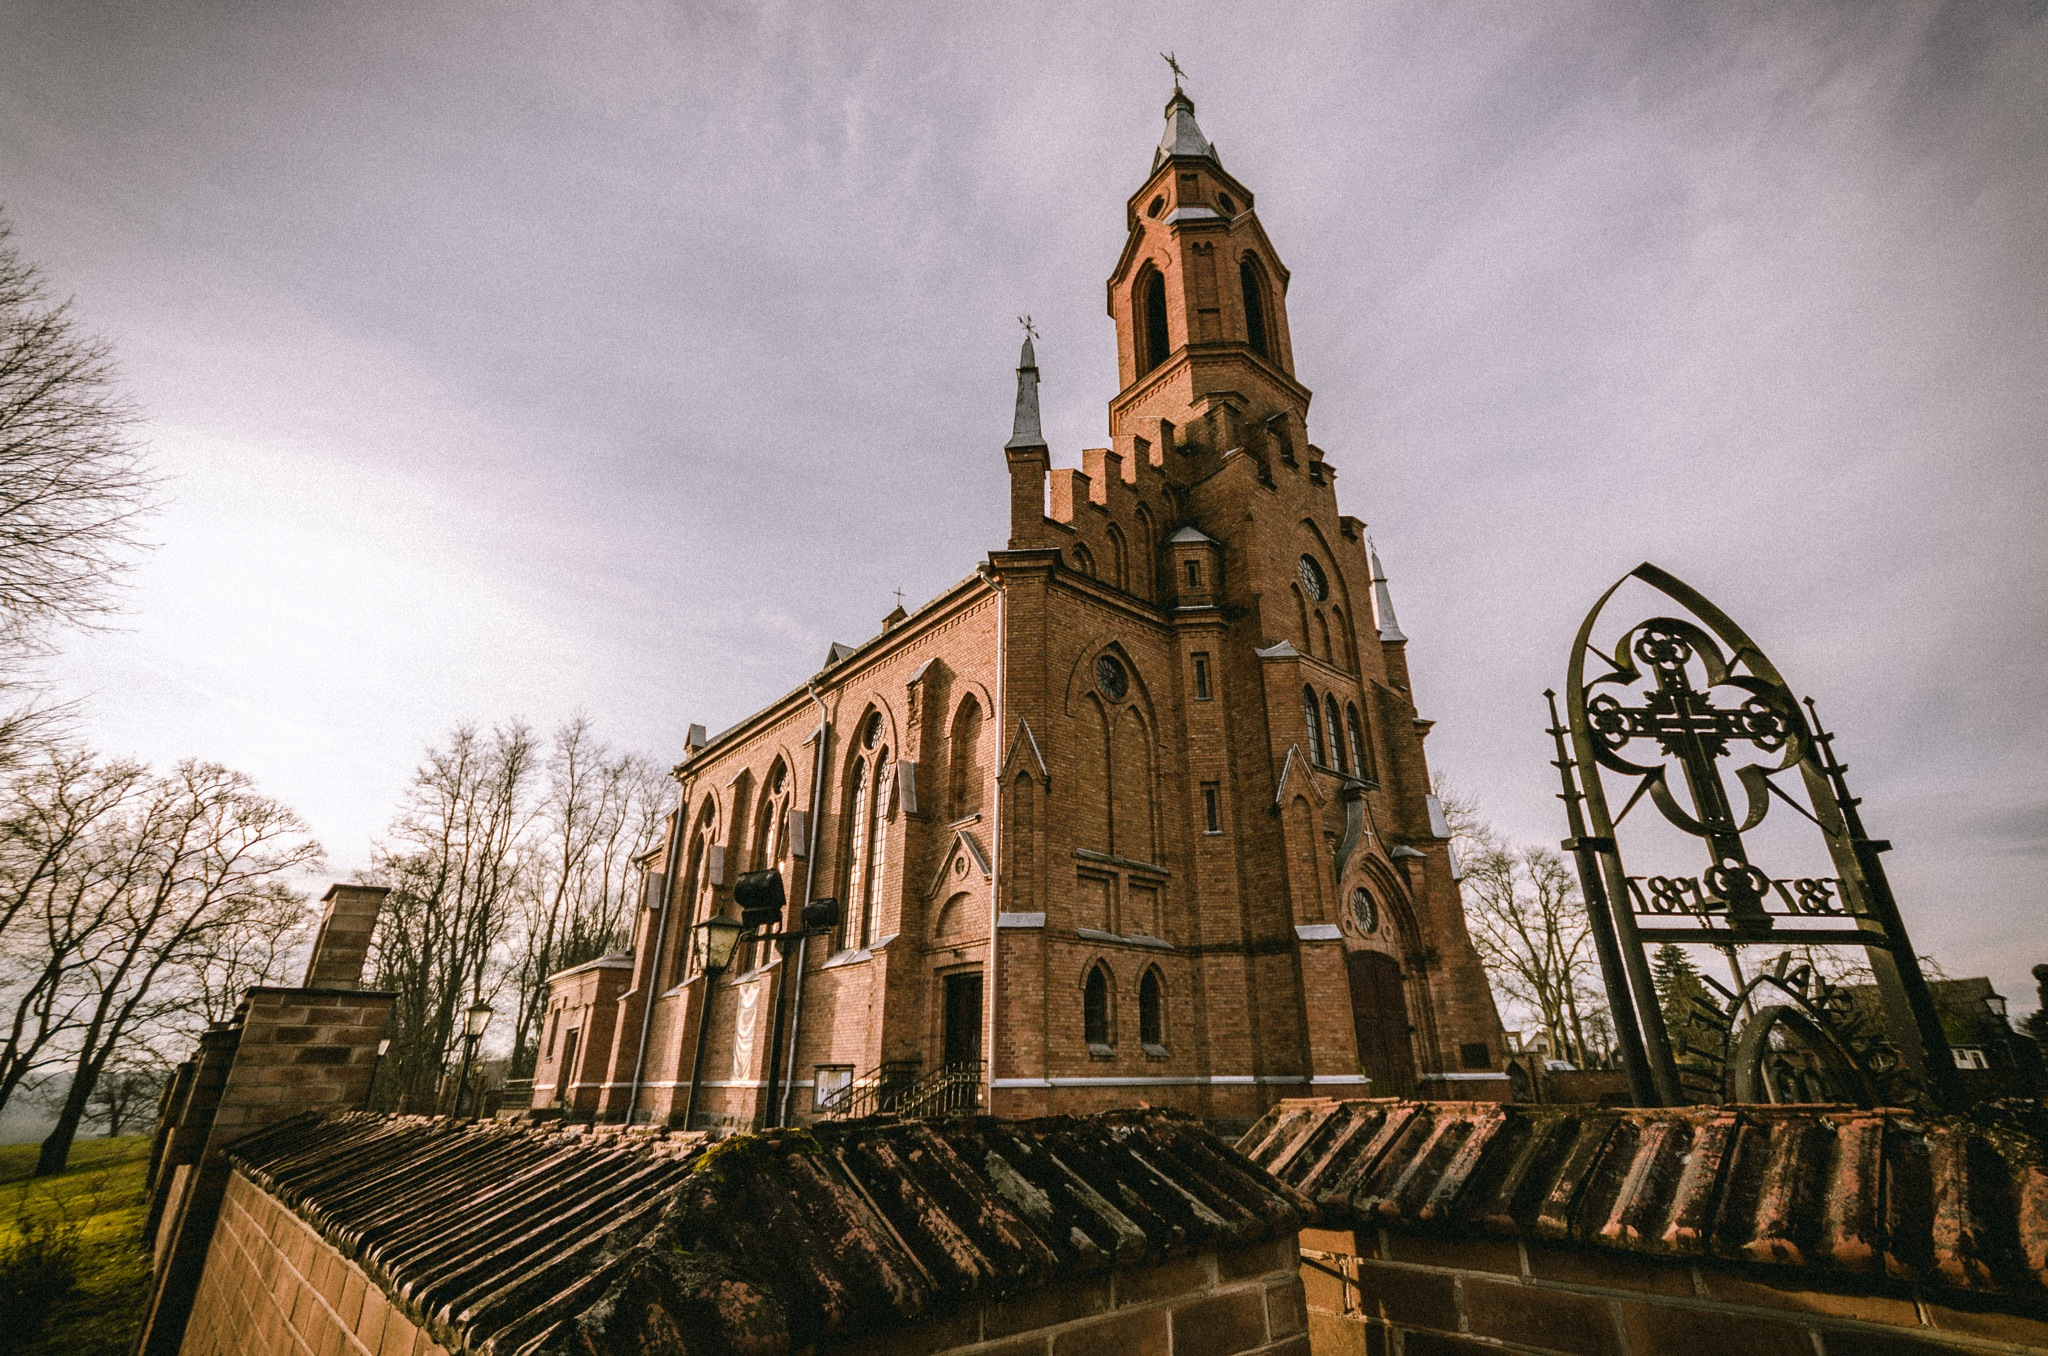 Church in Kernave by Keci